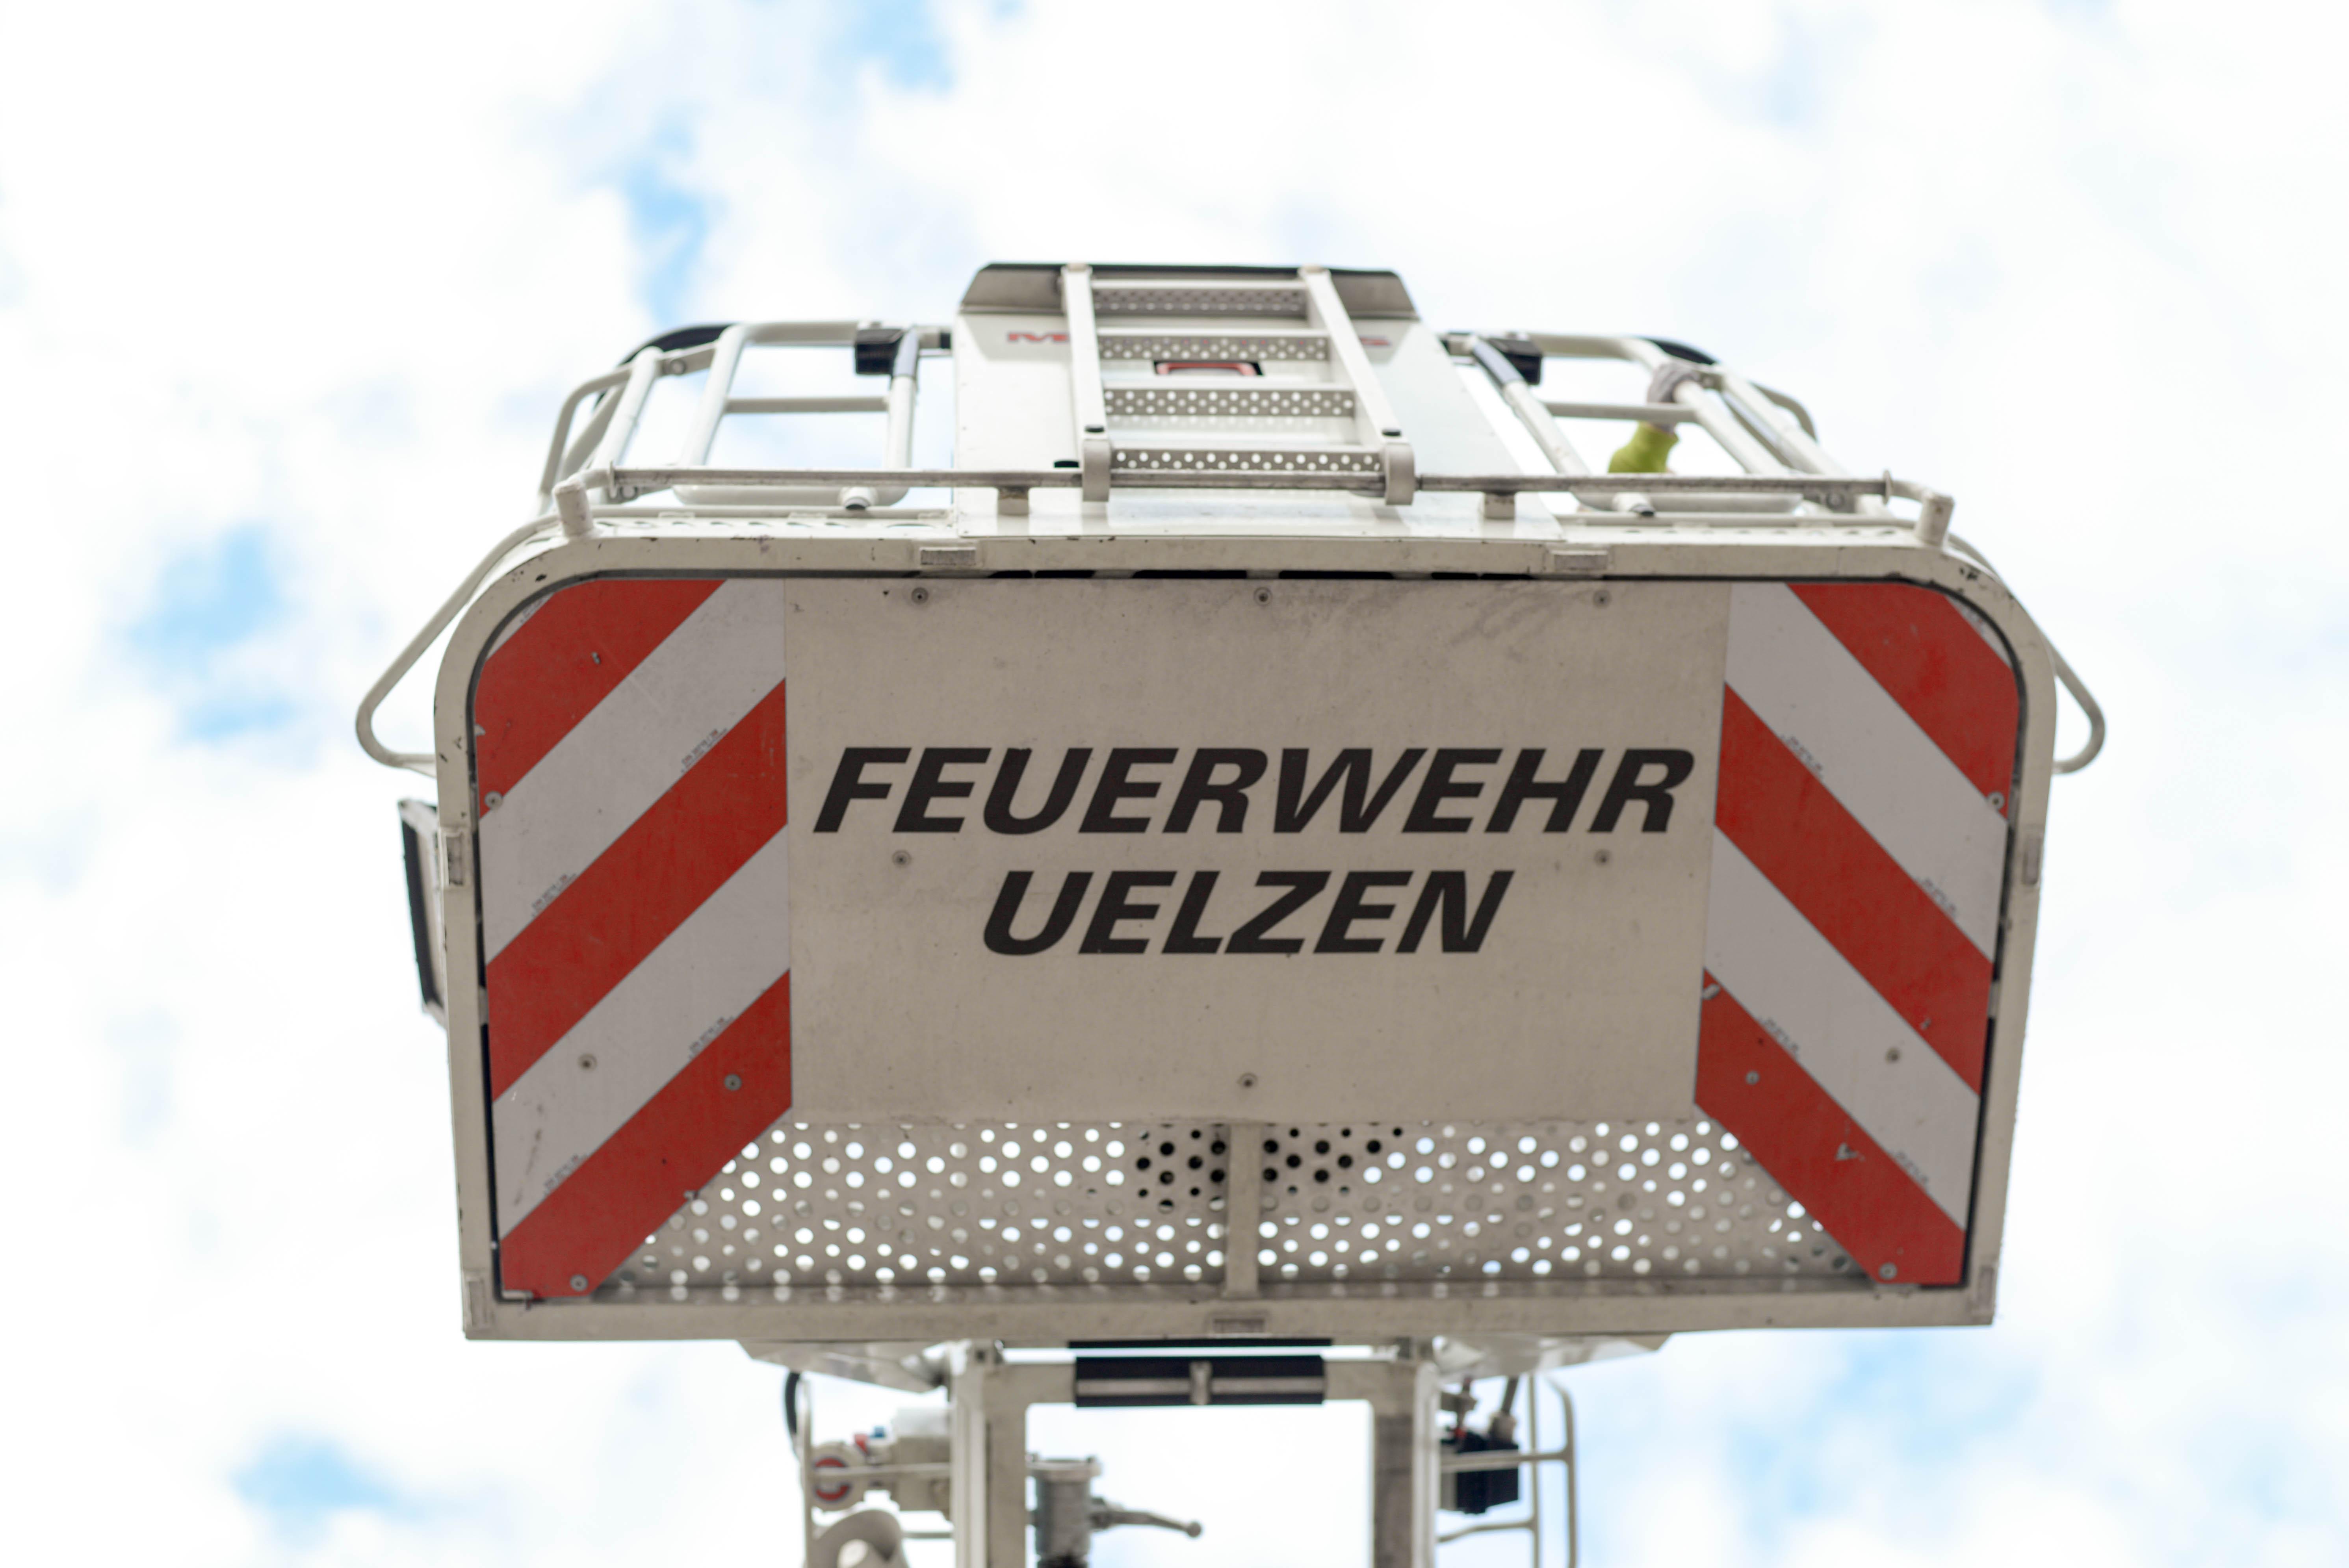 271. Hilfeleistung - - Personenrettung aus defekten Hubsteiger